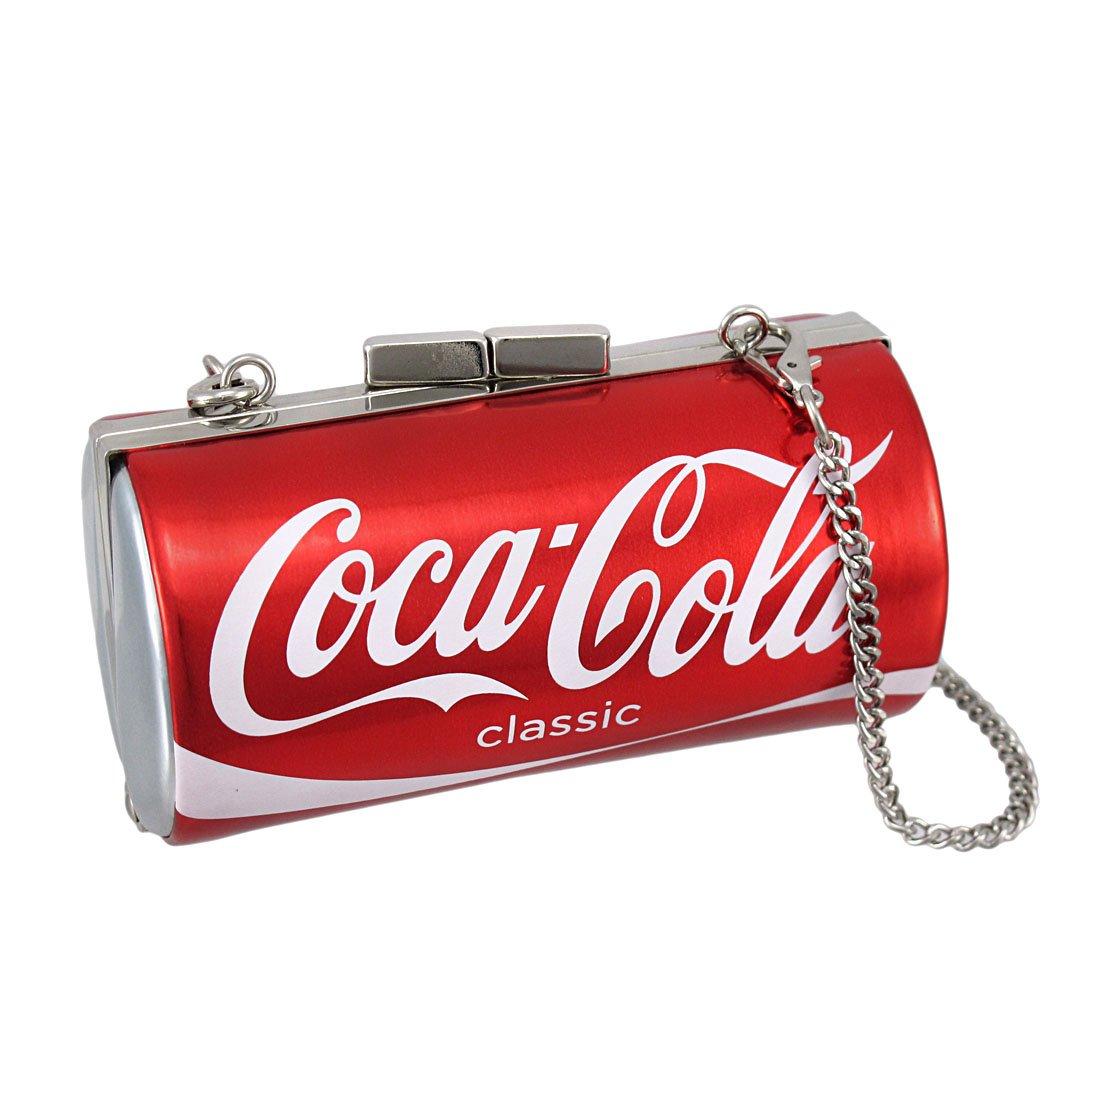 ویکالا · خرید  اصل اورجینال · خرید از آمازون · Licensed Coca-Cola Classic Can Evening Bag Coke Clutch wekala · ویکالا